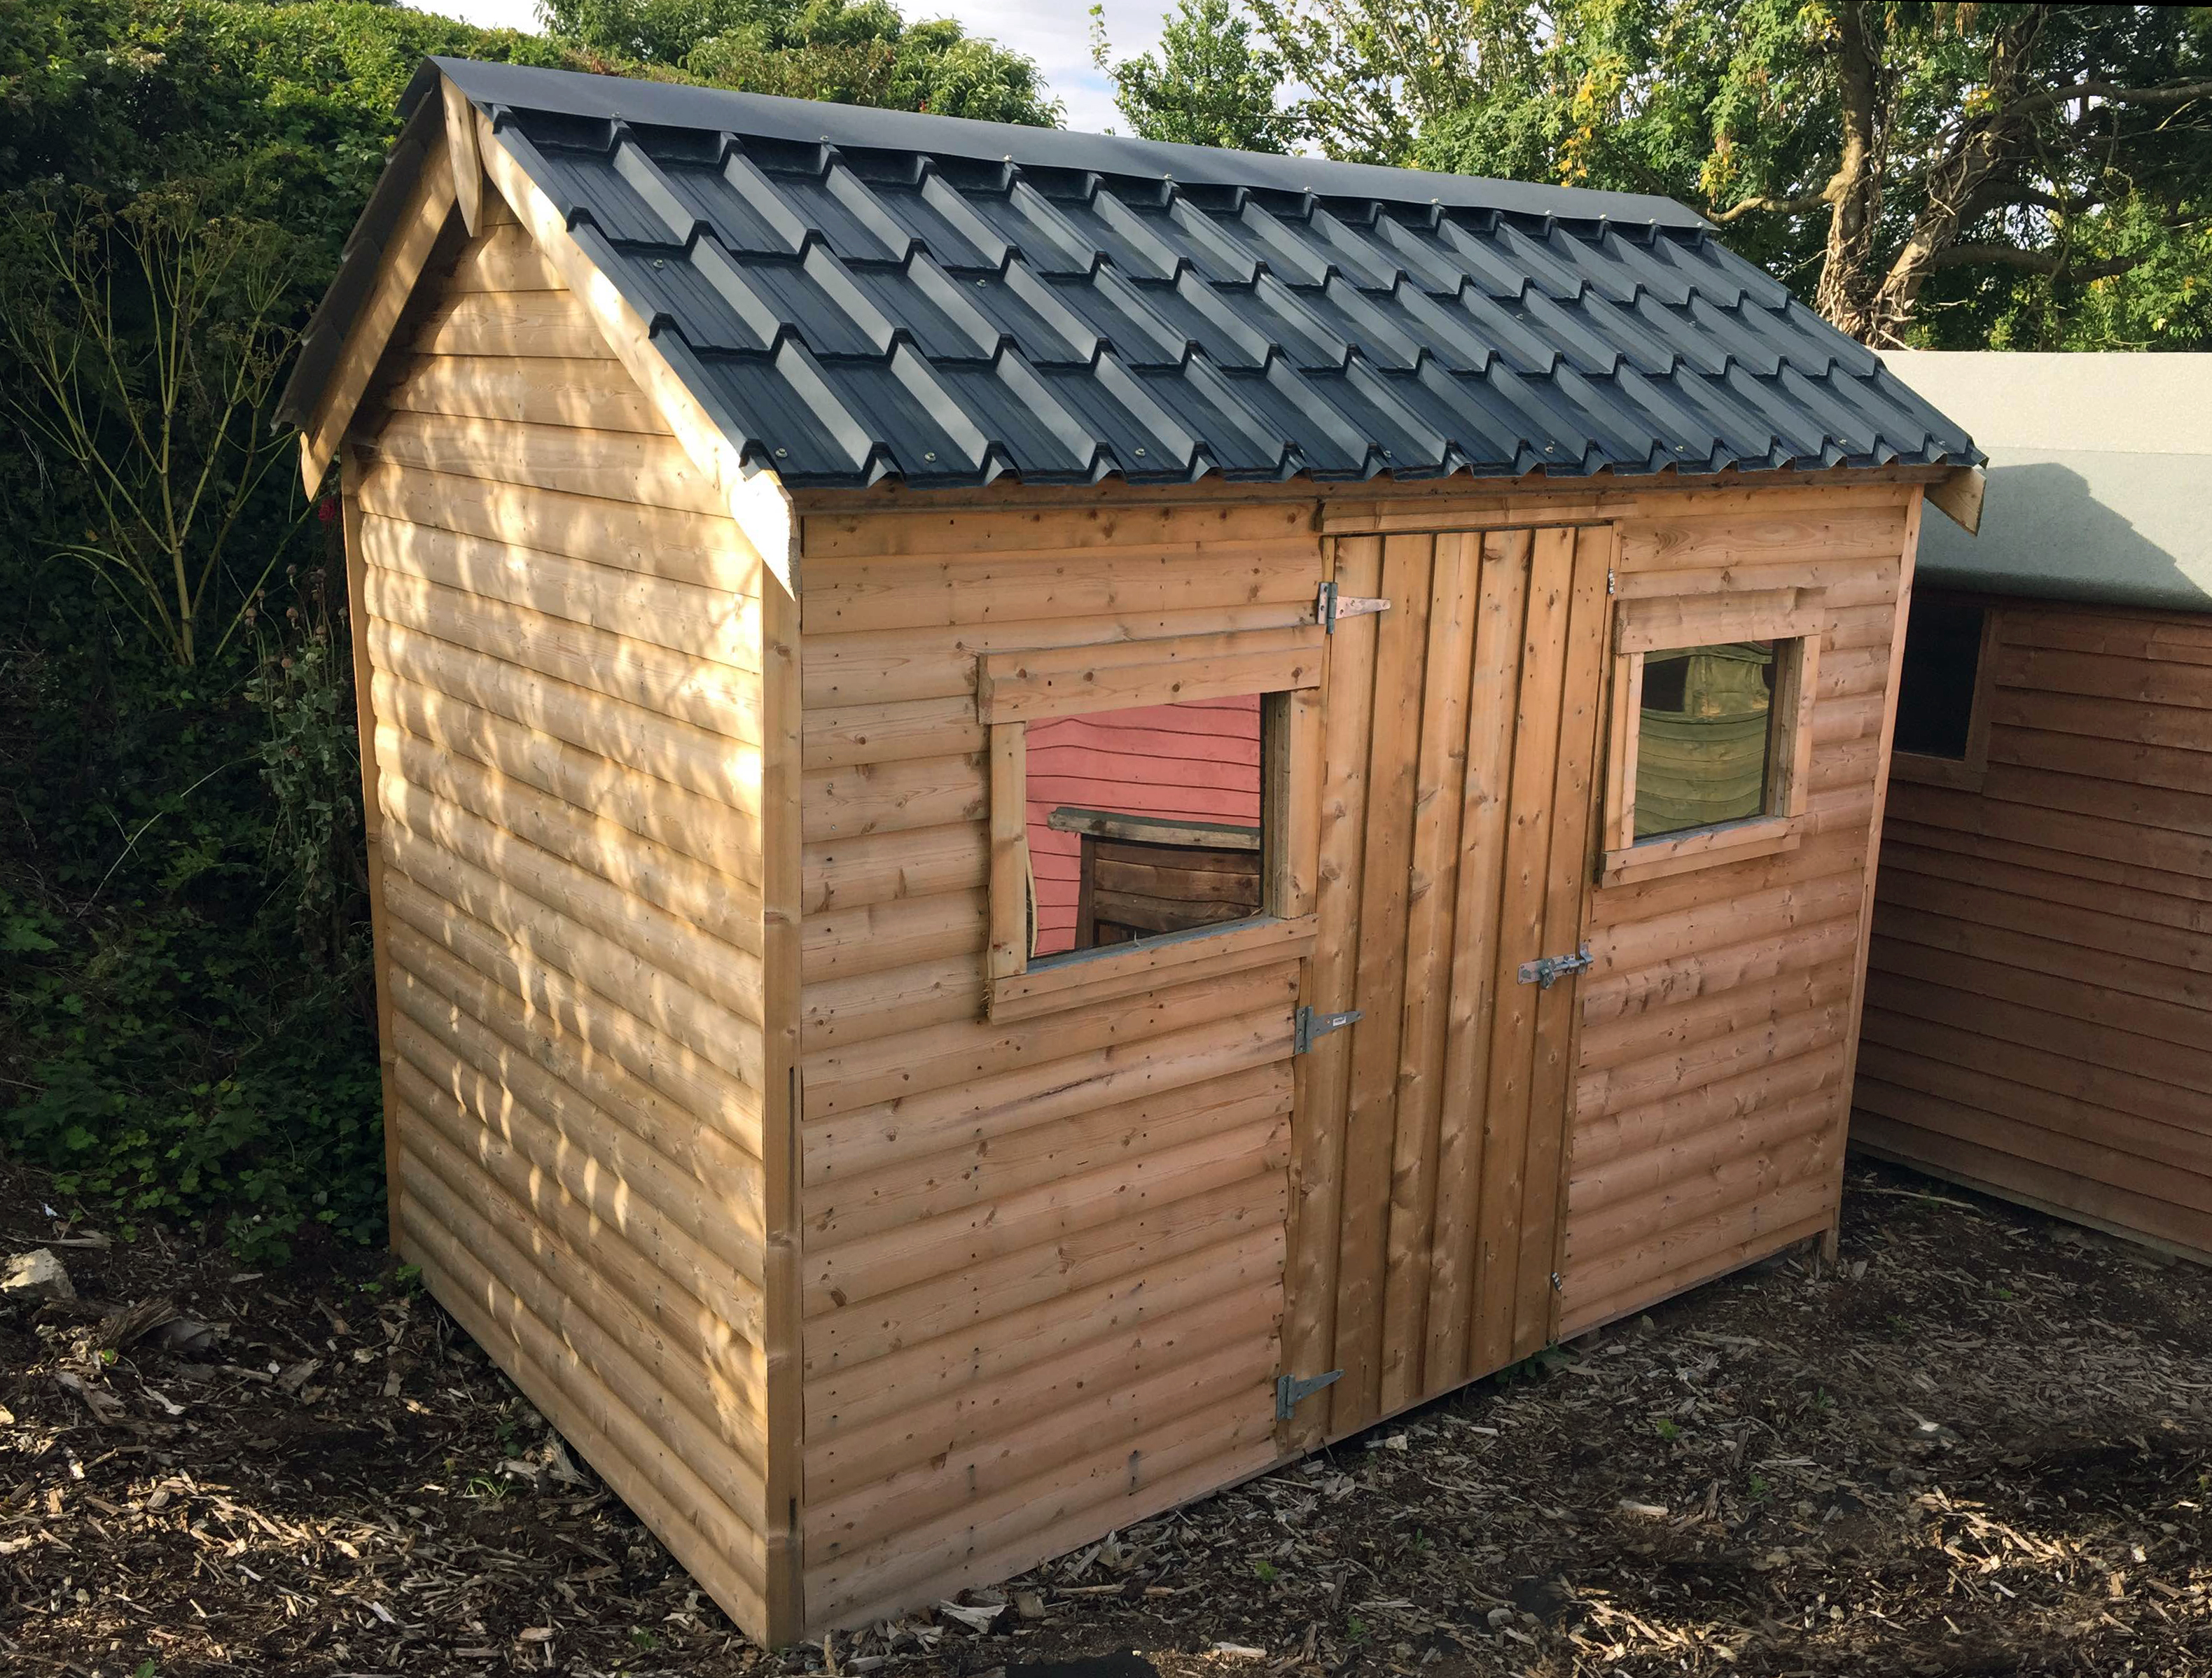 garden sheds ireland dublin wicklow wexford sheds. Black Bedroom Furniture Sets. Home Design Ideas